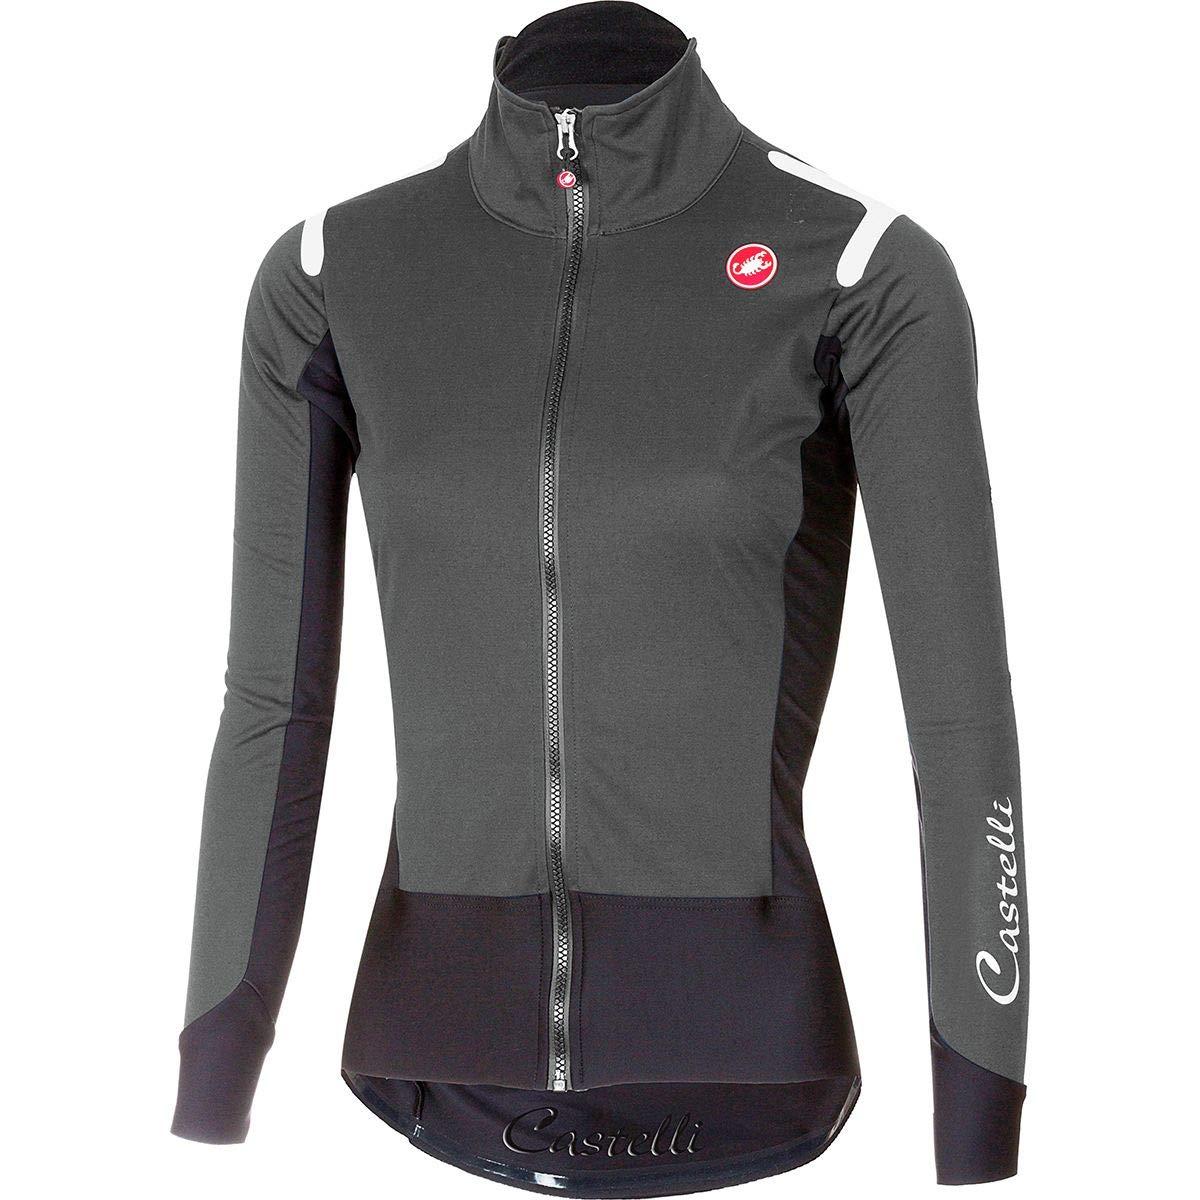 Castelli Alpha ROS Long-Sleeve Jersey - Women's Dark Gray/Black, XS